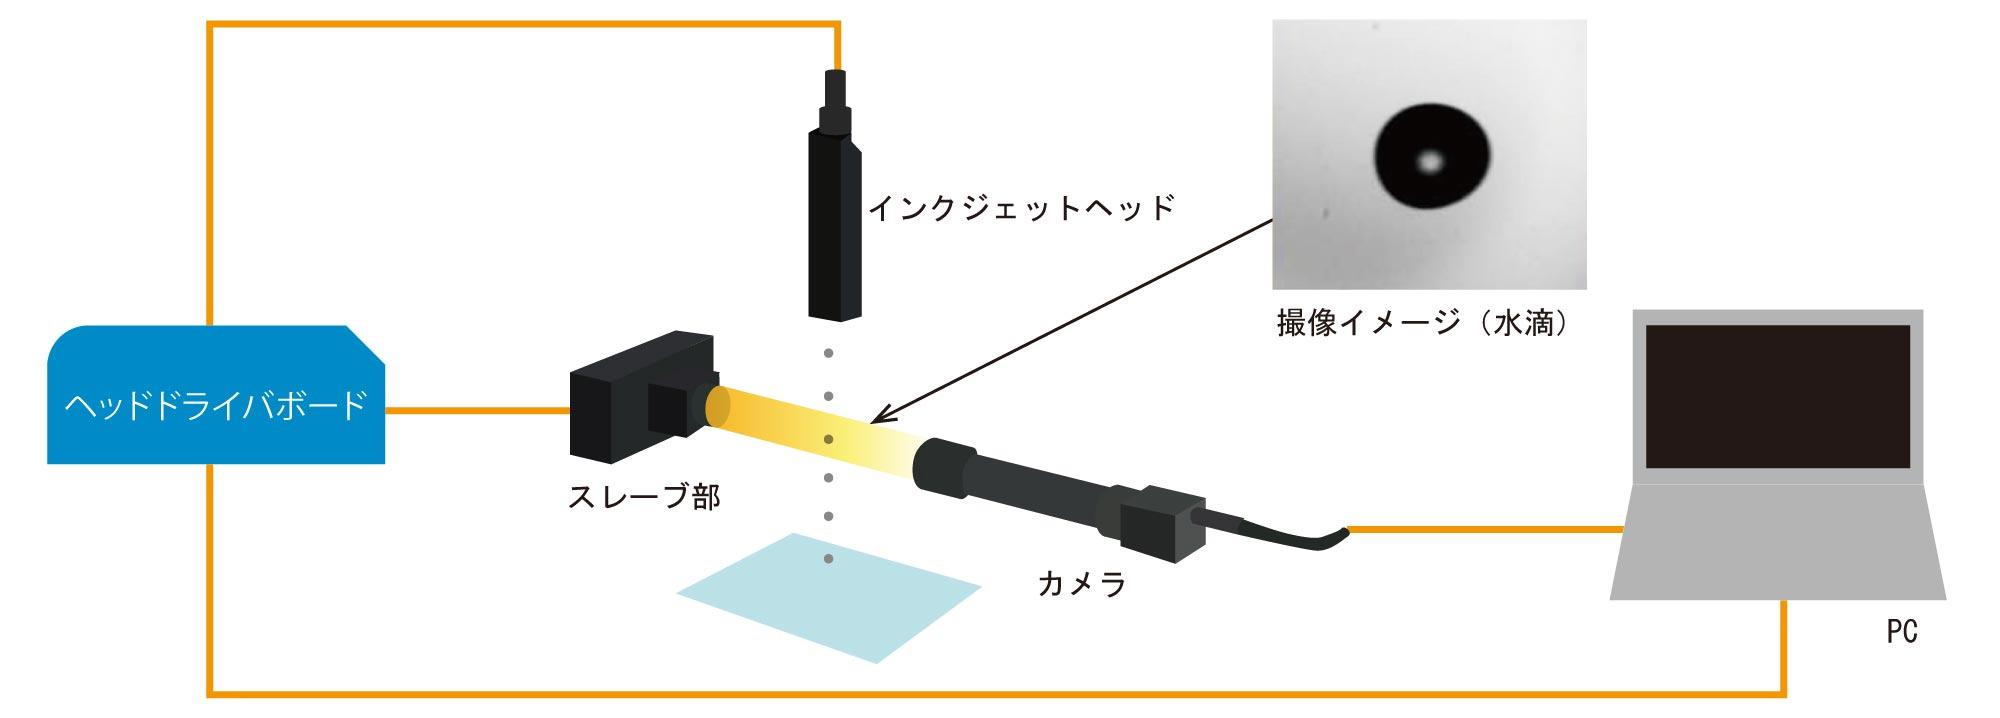 ISU-NS Product Description 01